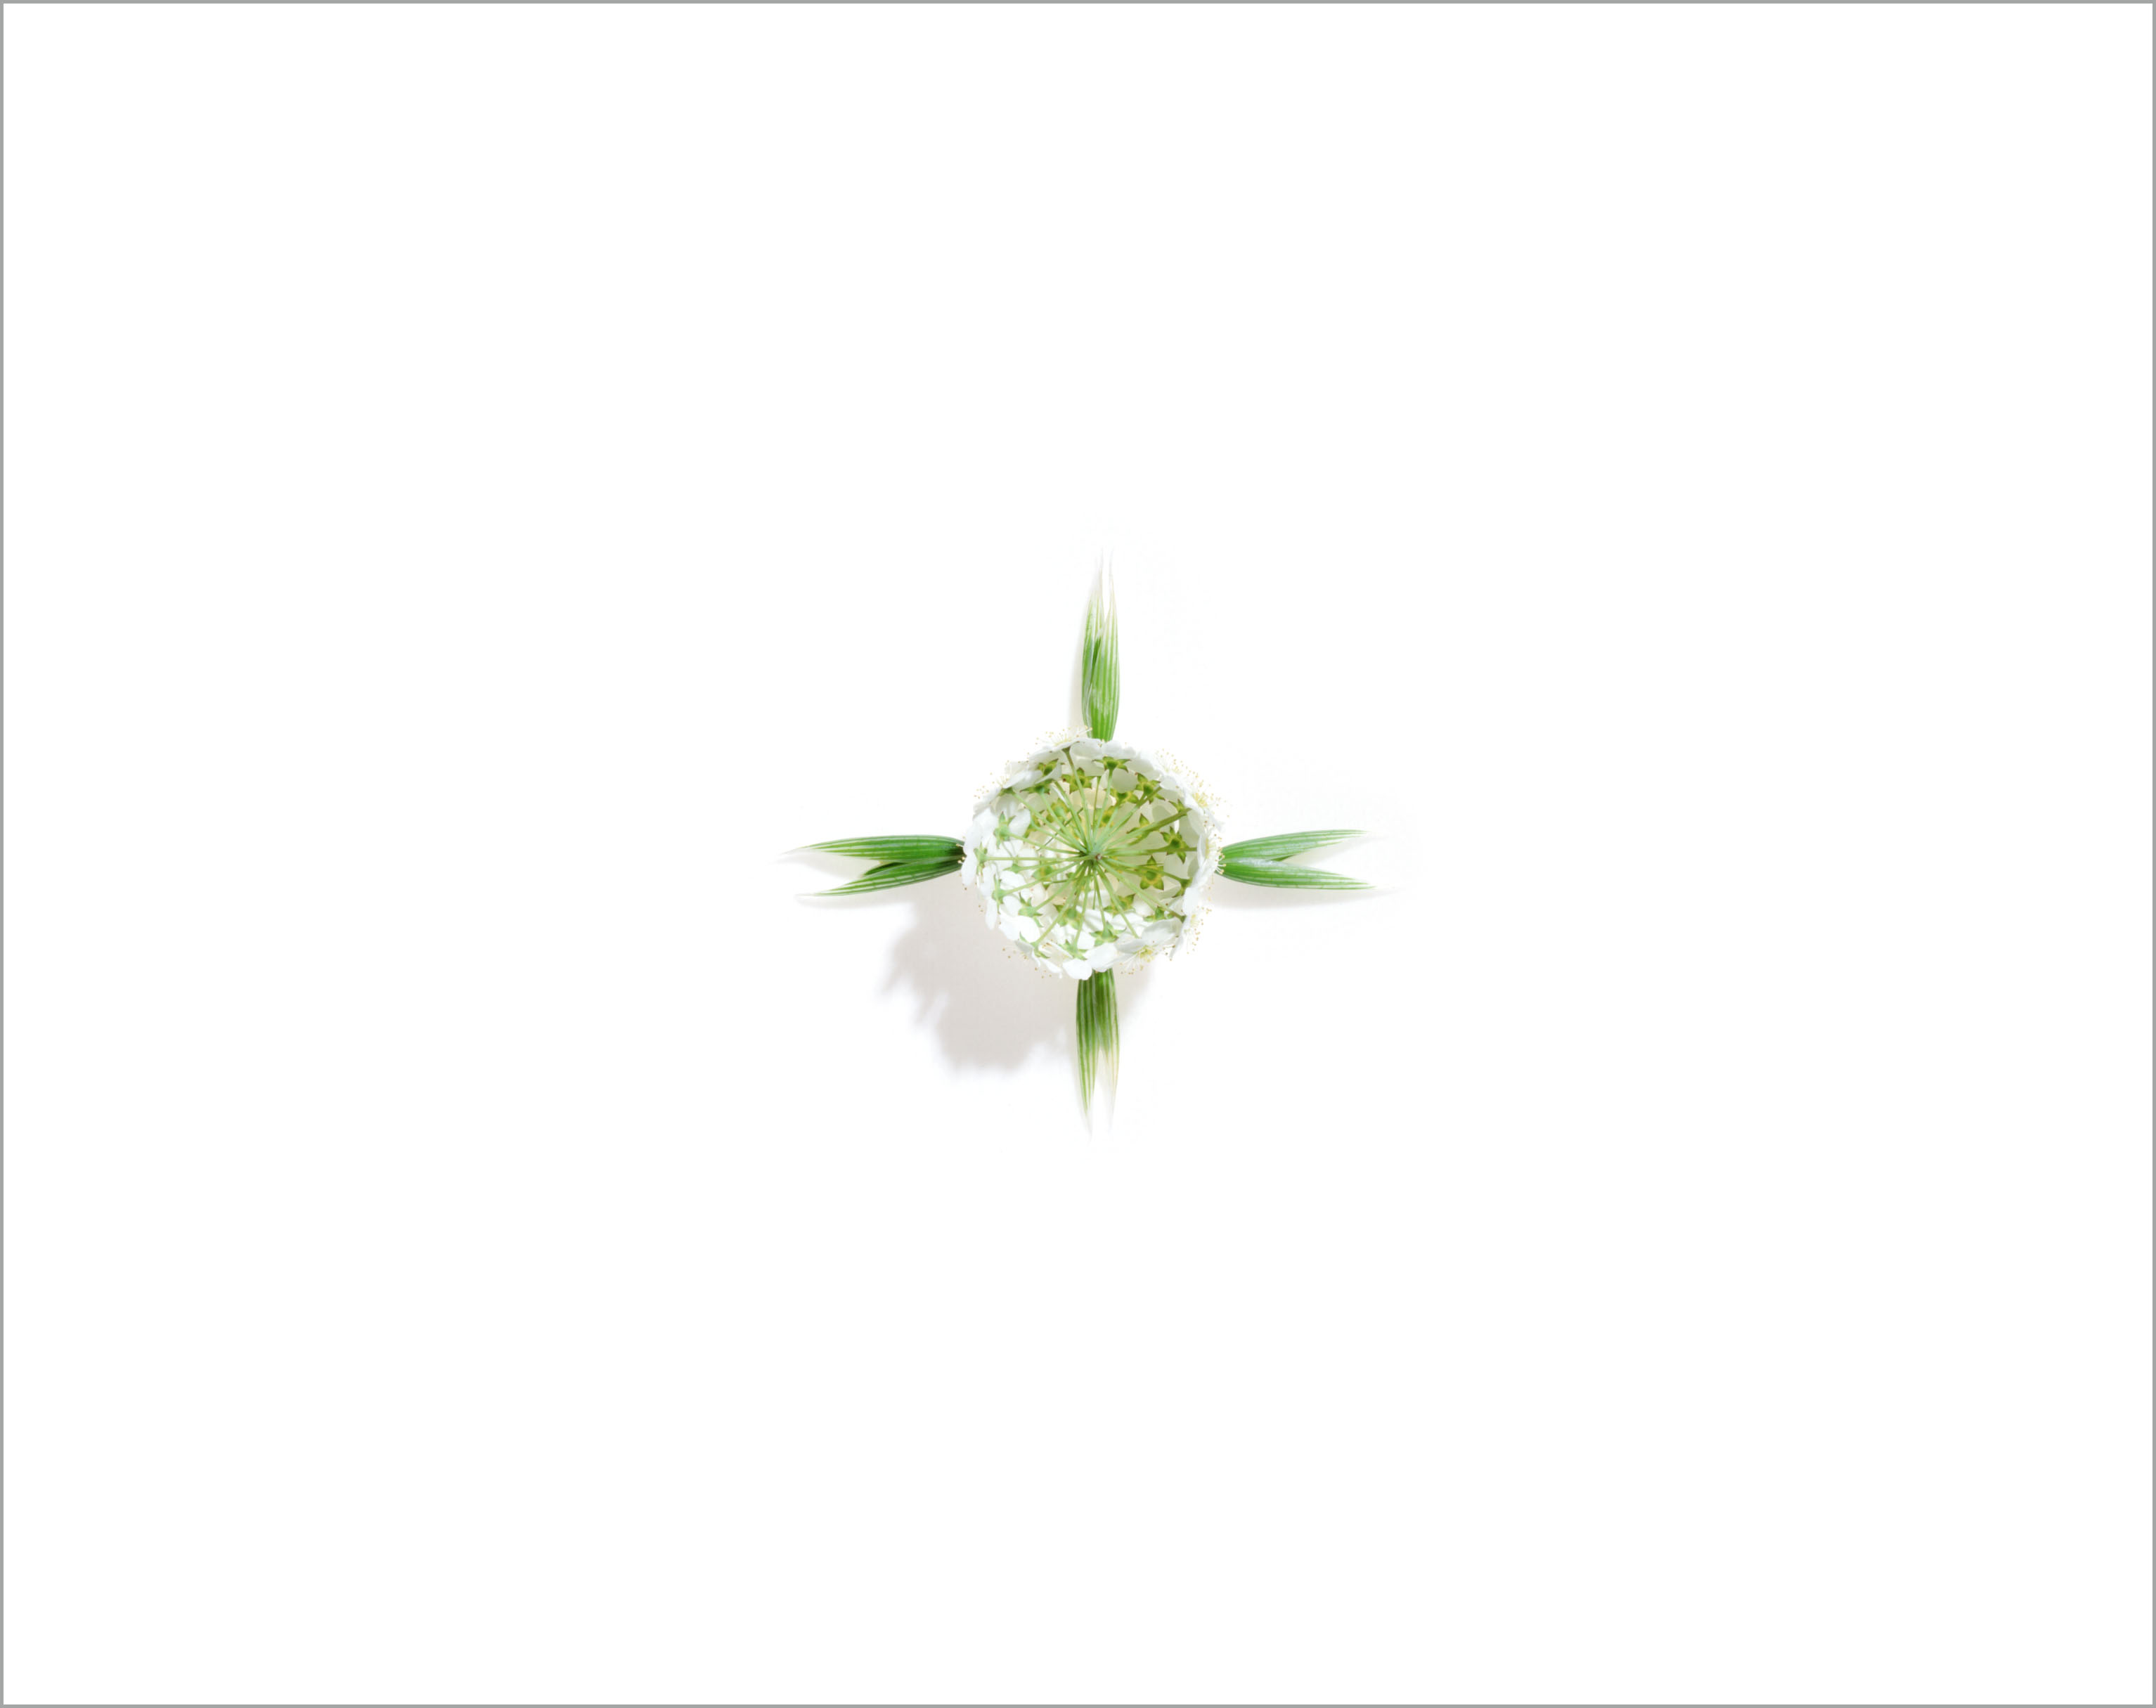 009_flora